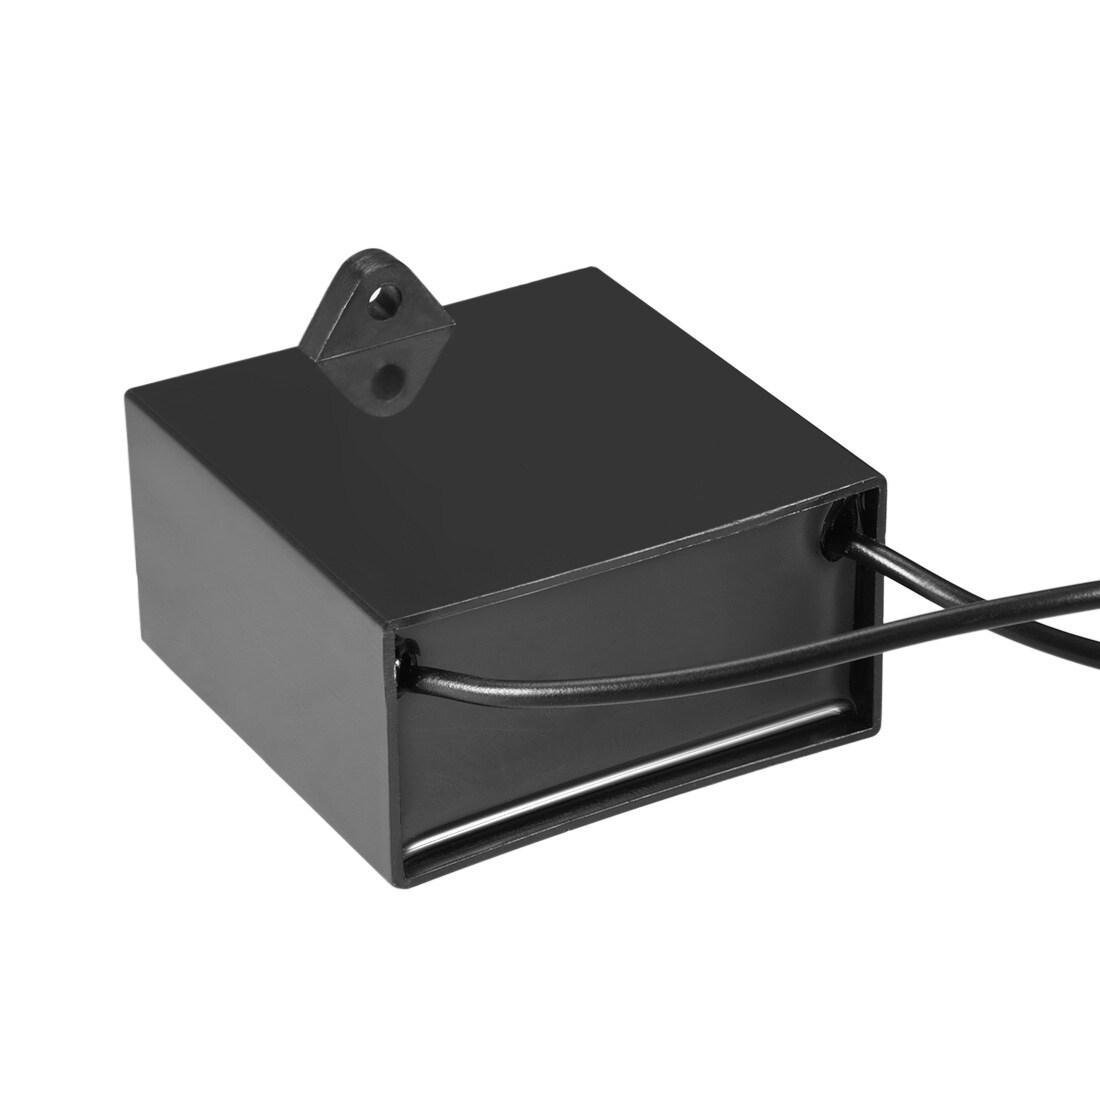 CBB61 Run Capacitor 450V AC 30uF Metallized Polypropylene Film Capacitors